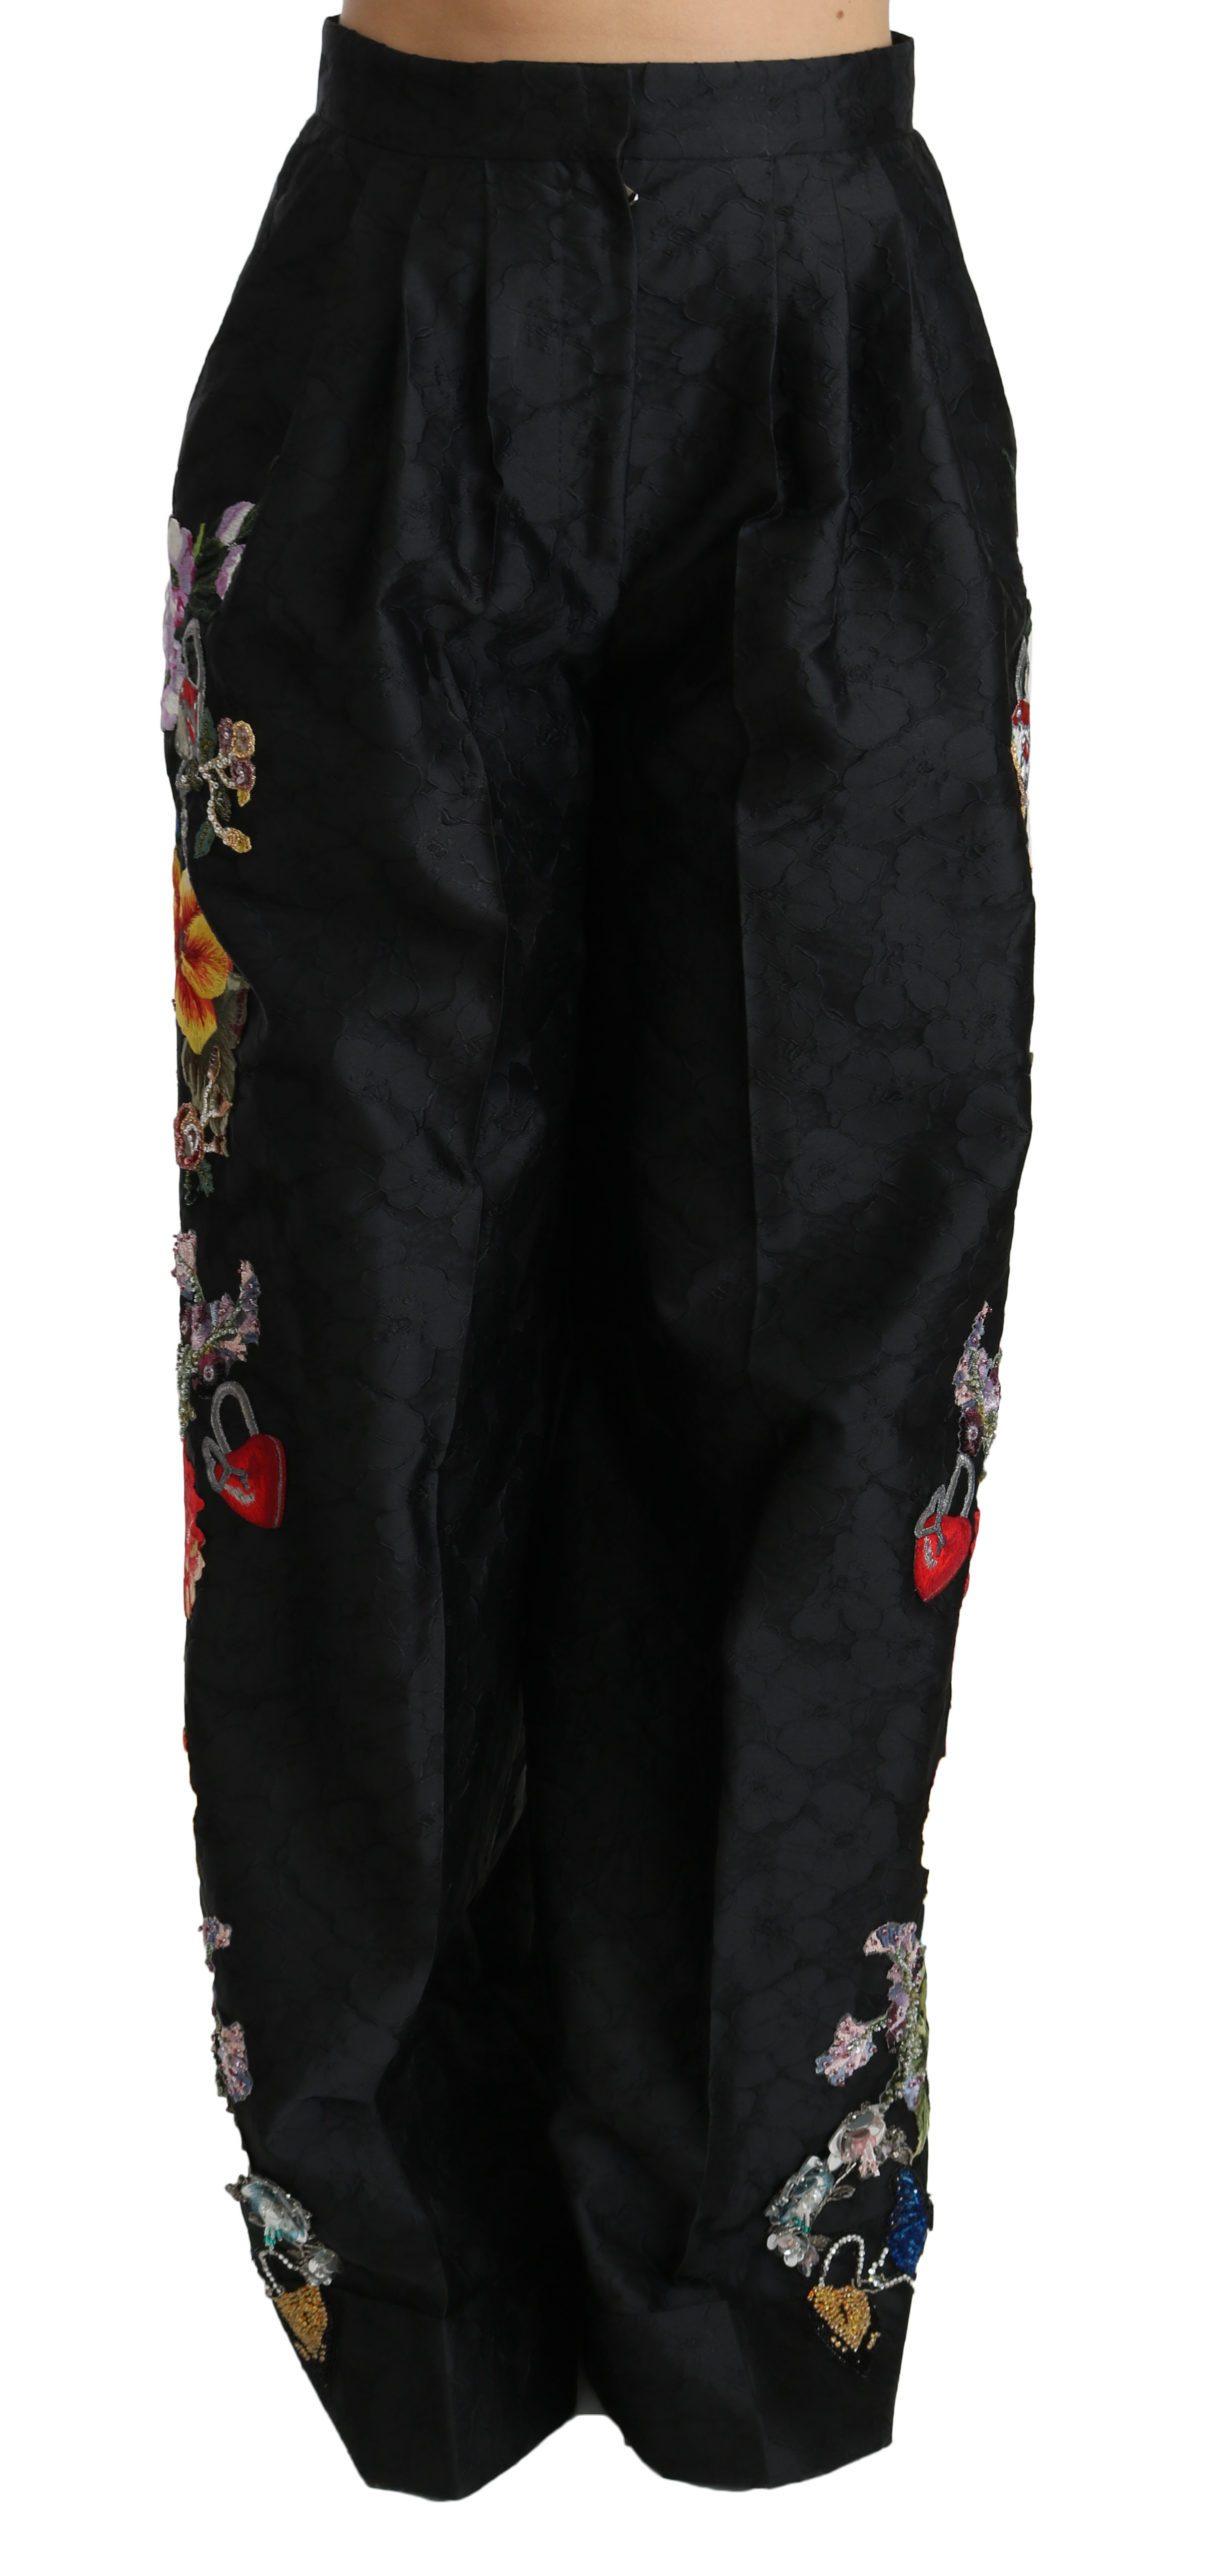 Dolce & Gabbana Brocade Floral Sequined Pants Black PAN70875-42 - IT42|M